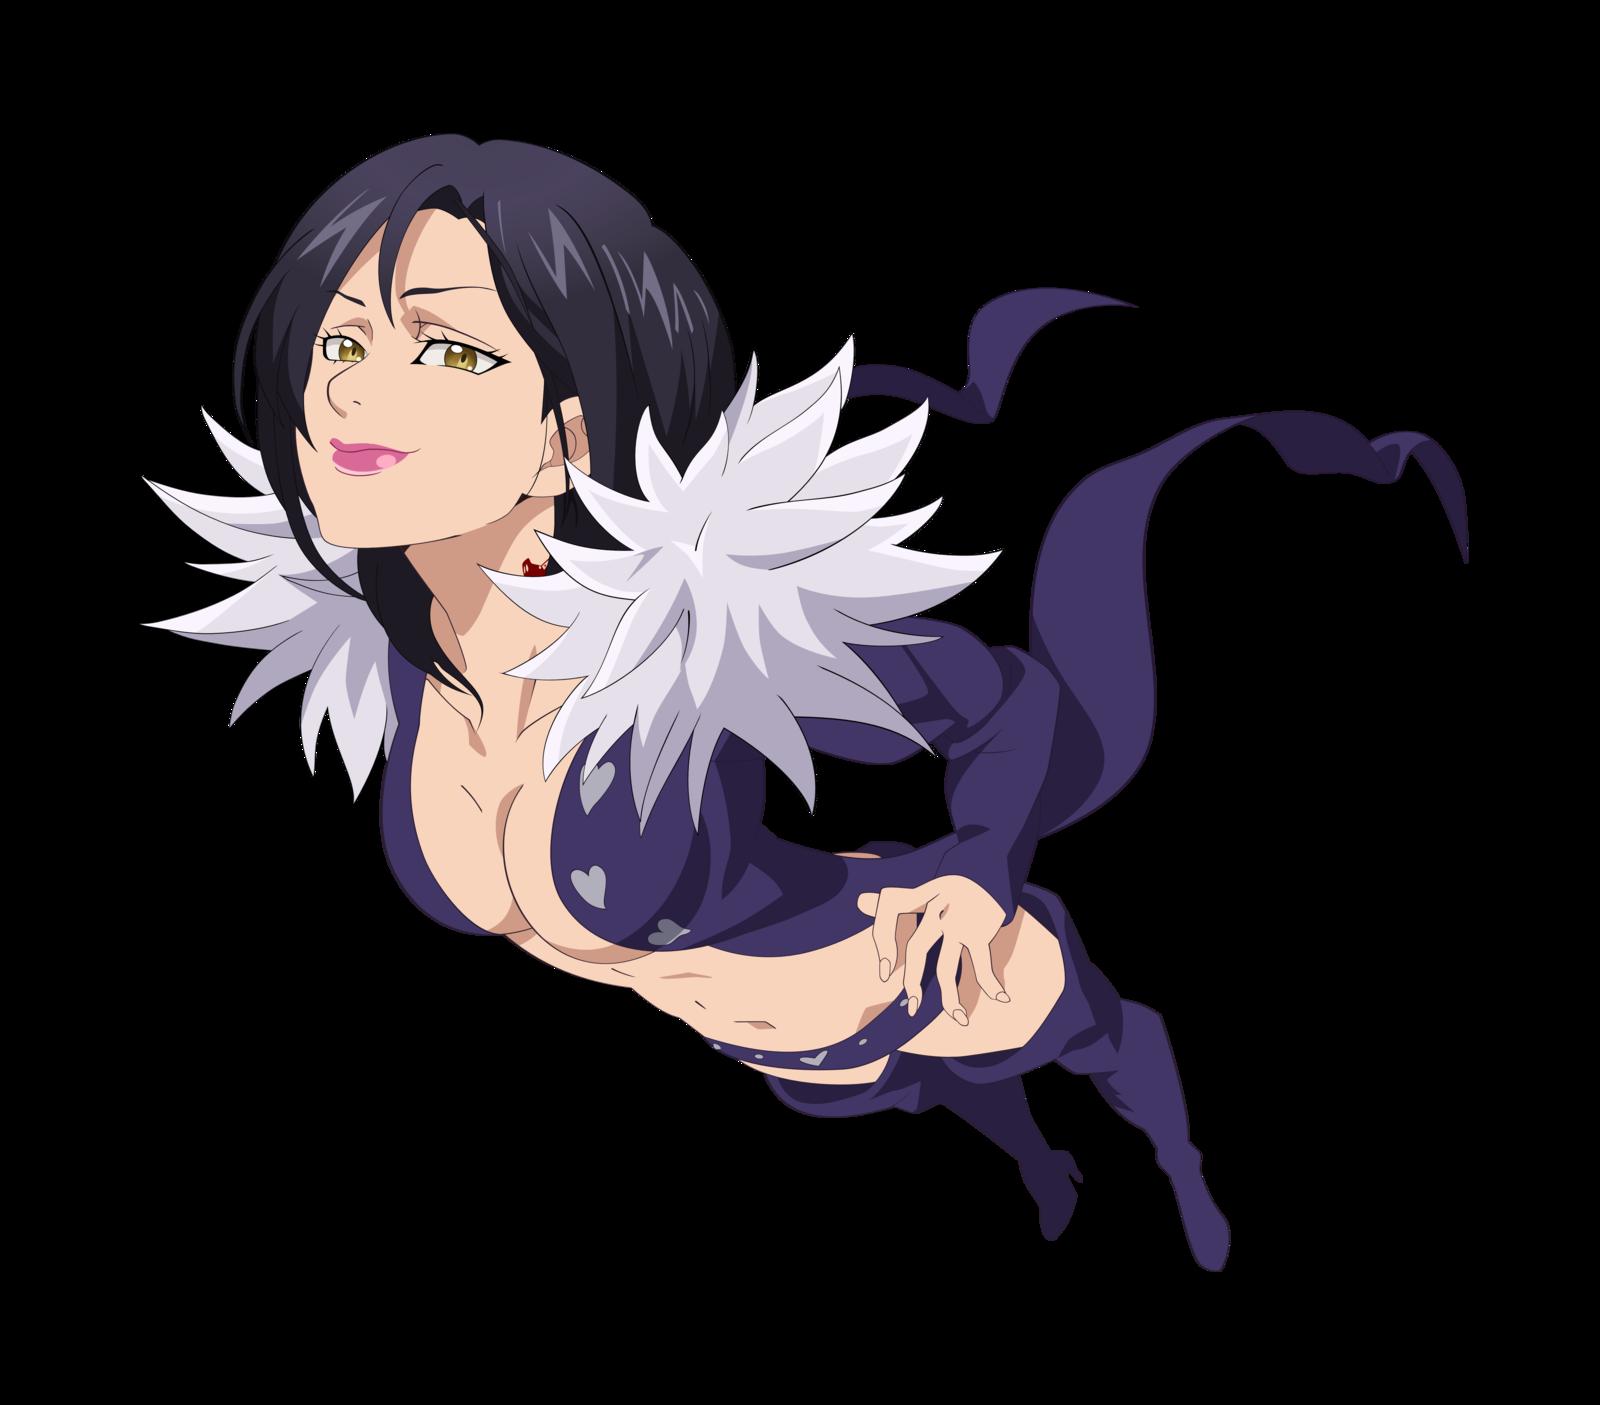 K Anime Characters Wikipedia : Merlin nanatsu no taizai vs battles wiki fandom